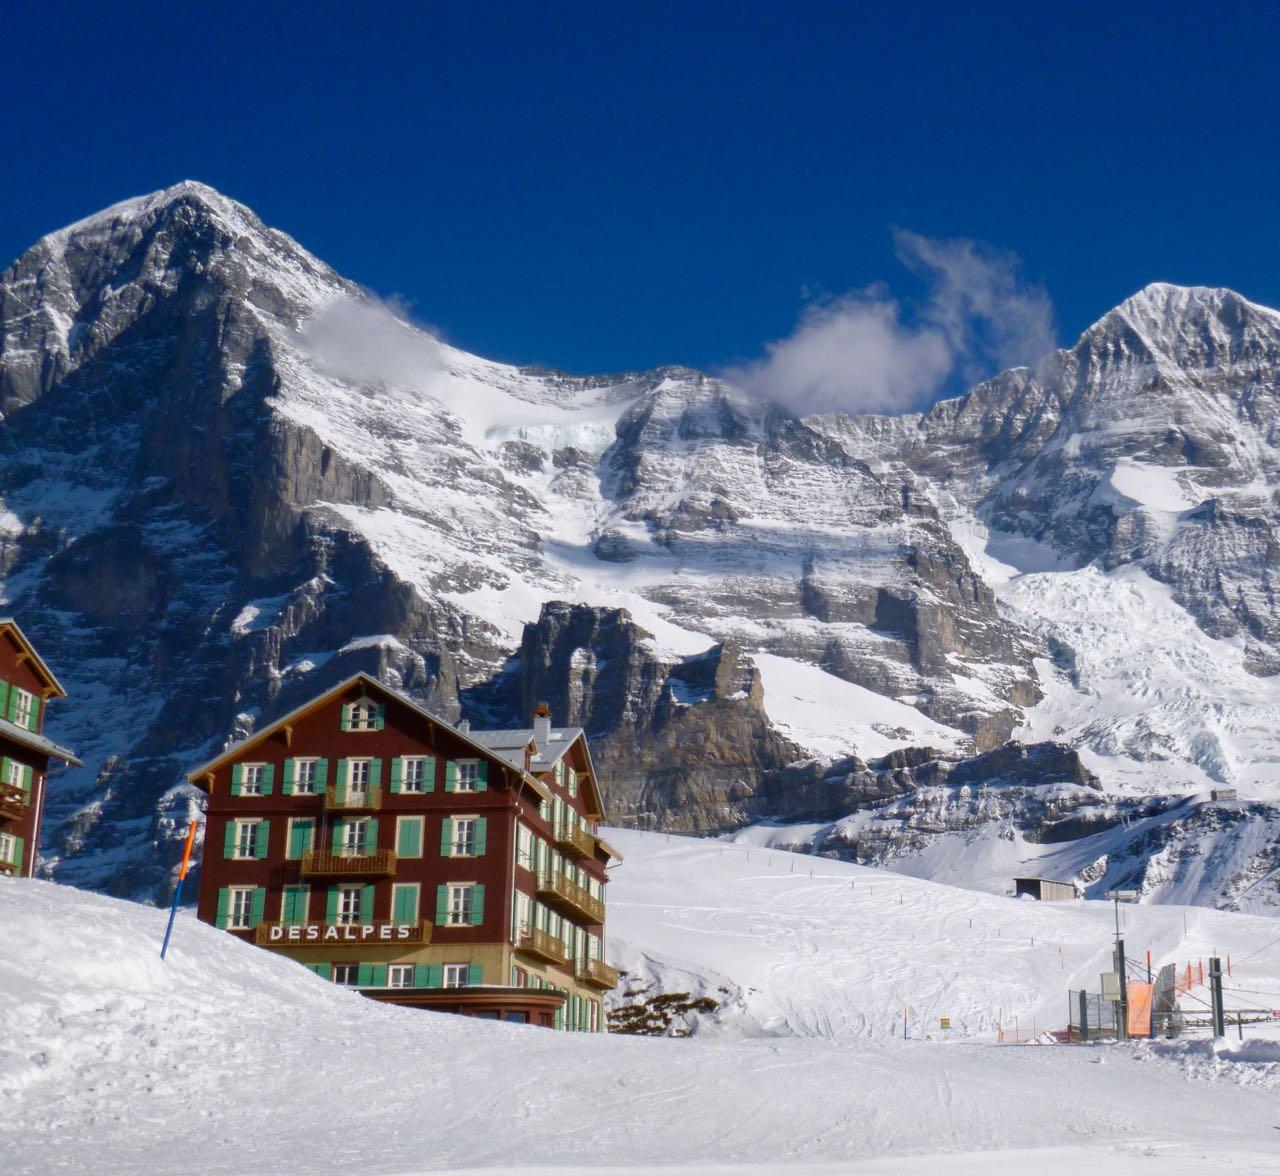 Eiger Glacier monitoring